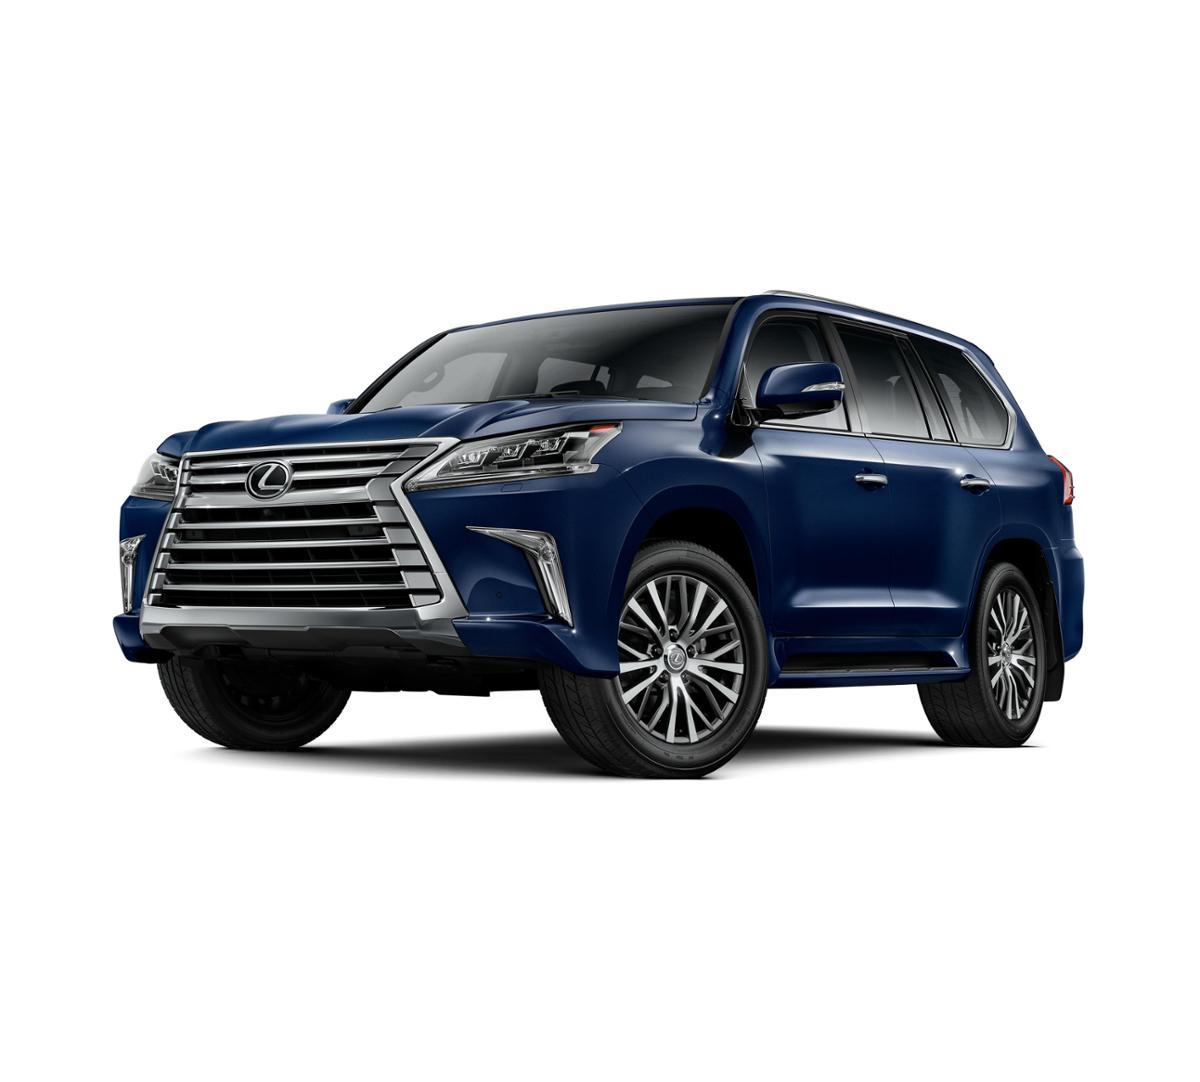 Lexus Sale: Towson Nightfall Mica 2019 Lexus LX 570: New Suv For Sale